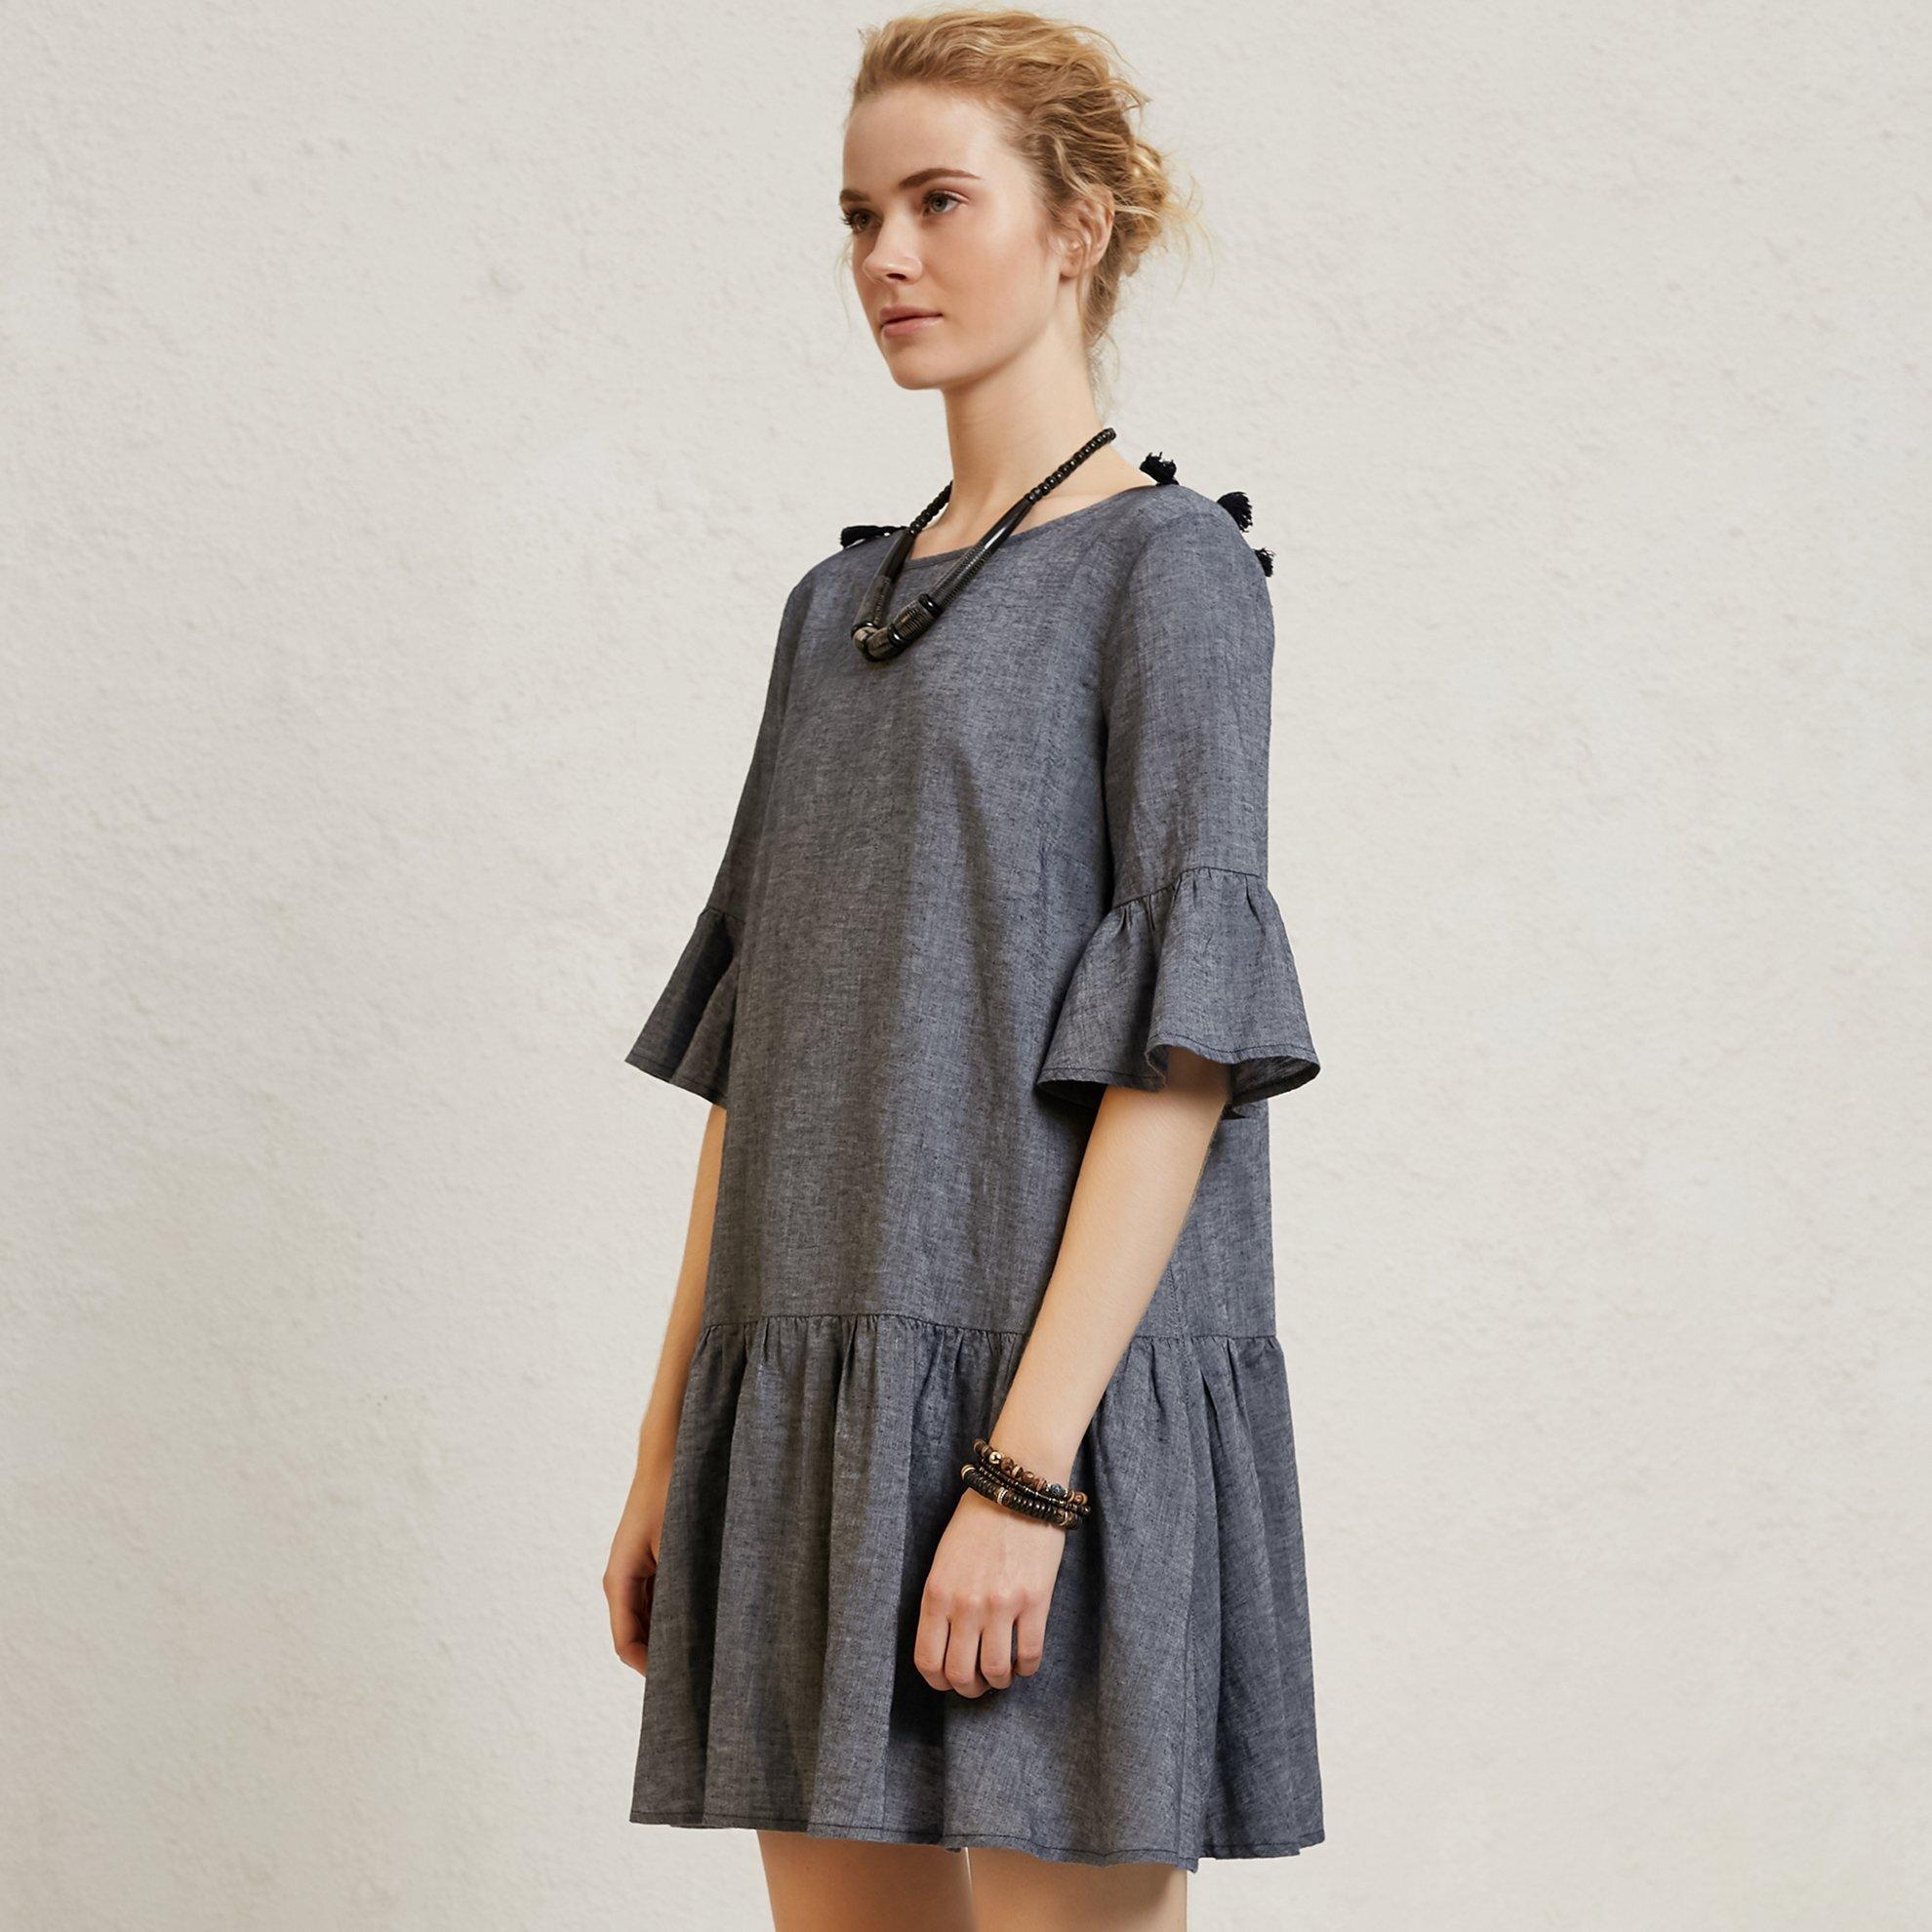 Fringe Detailed  Dress